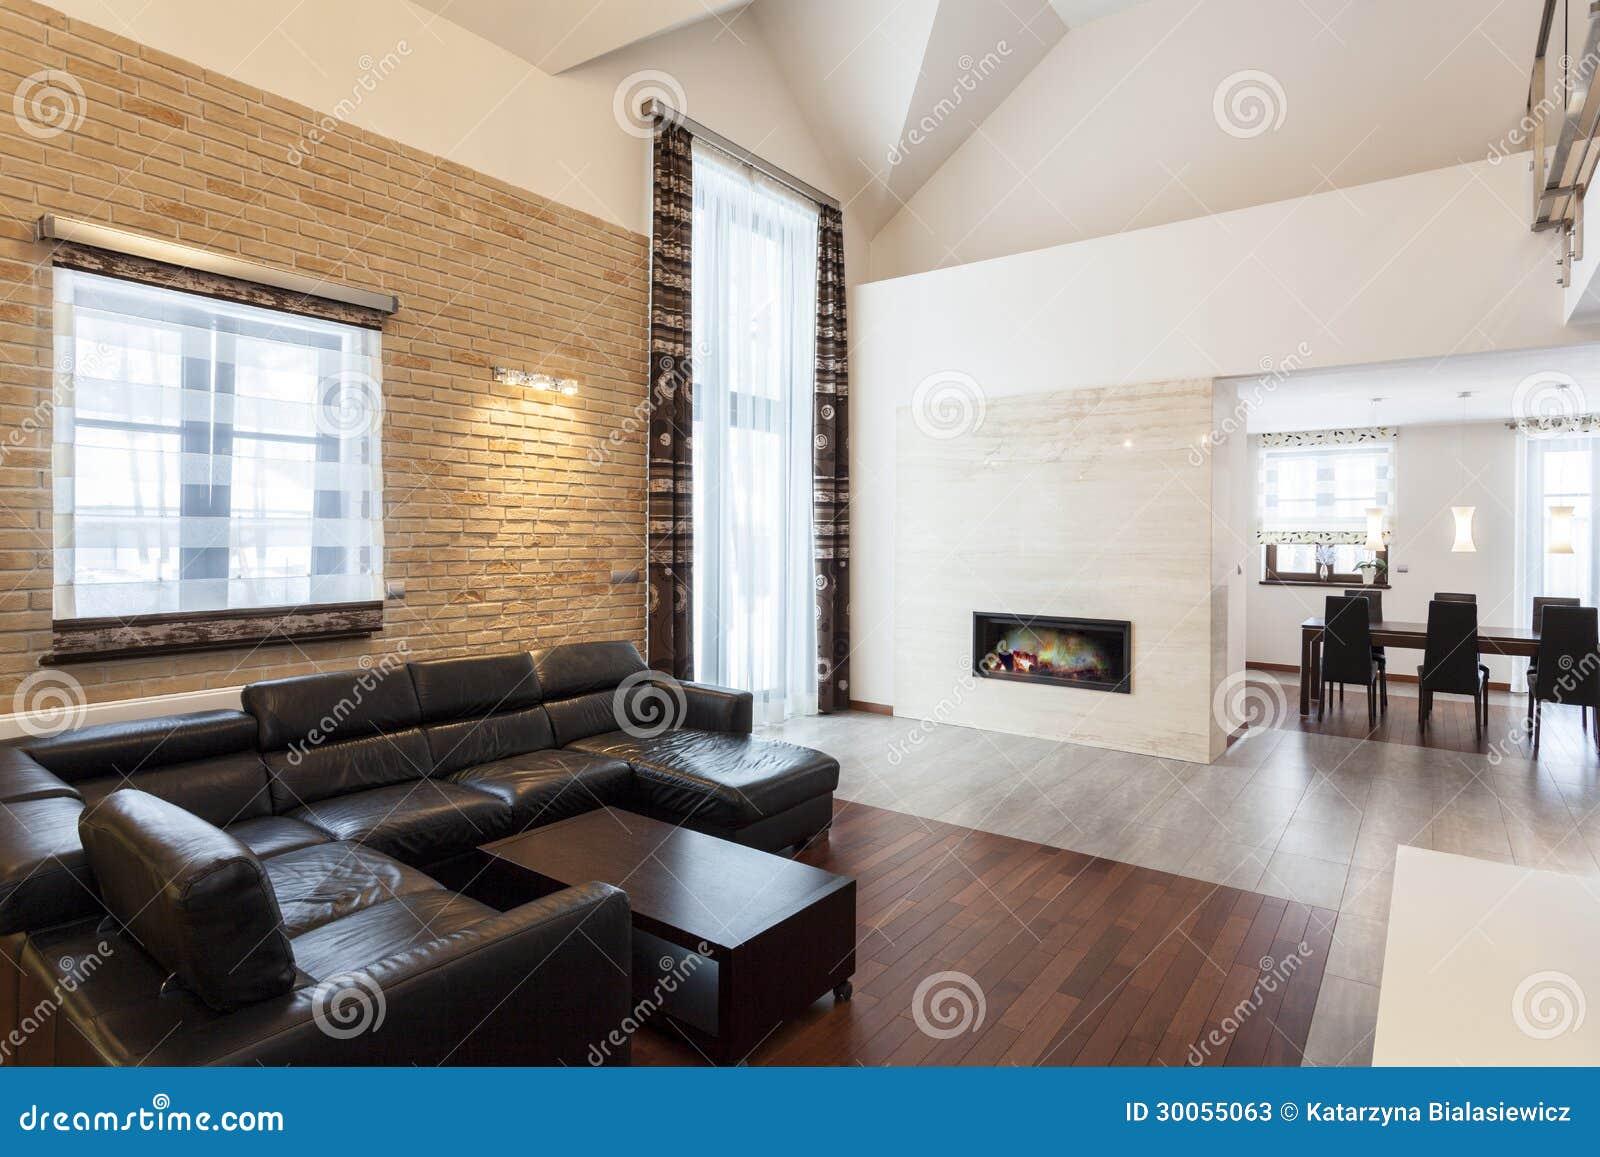 Grand Design Living Room Stock Photos Image 30055063